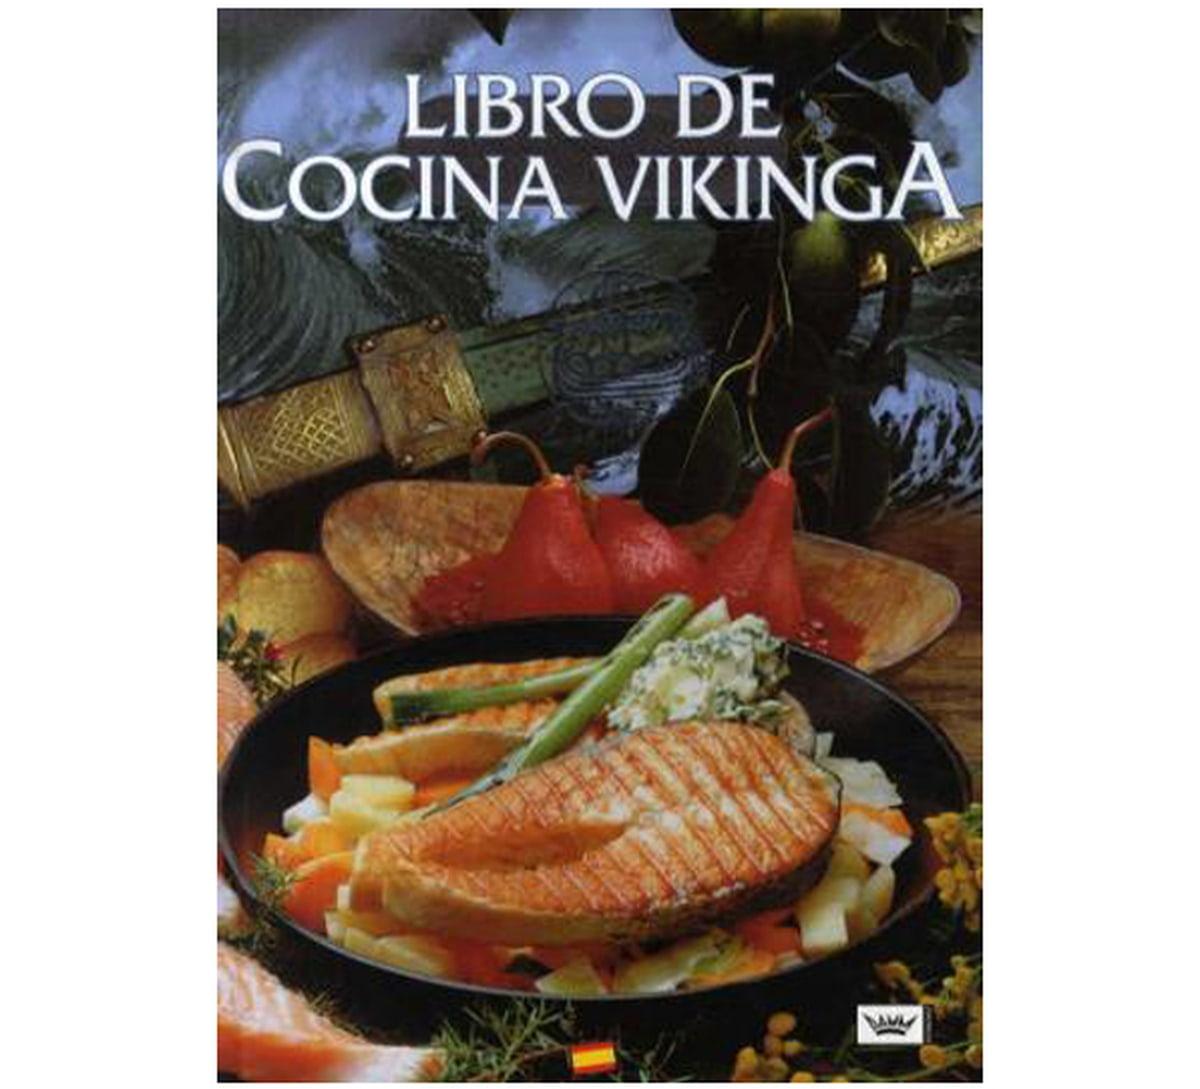 Viking recipies / Recetas vikingas